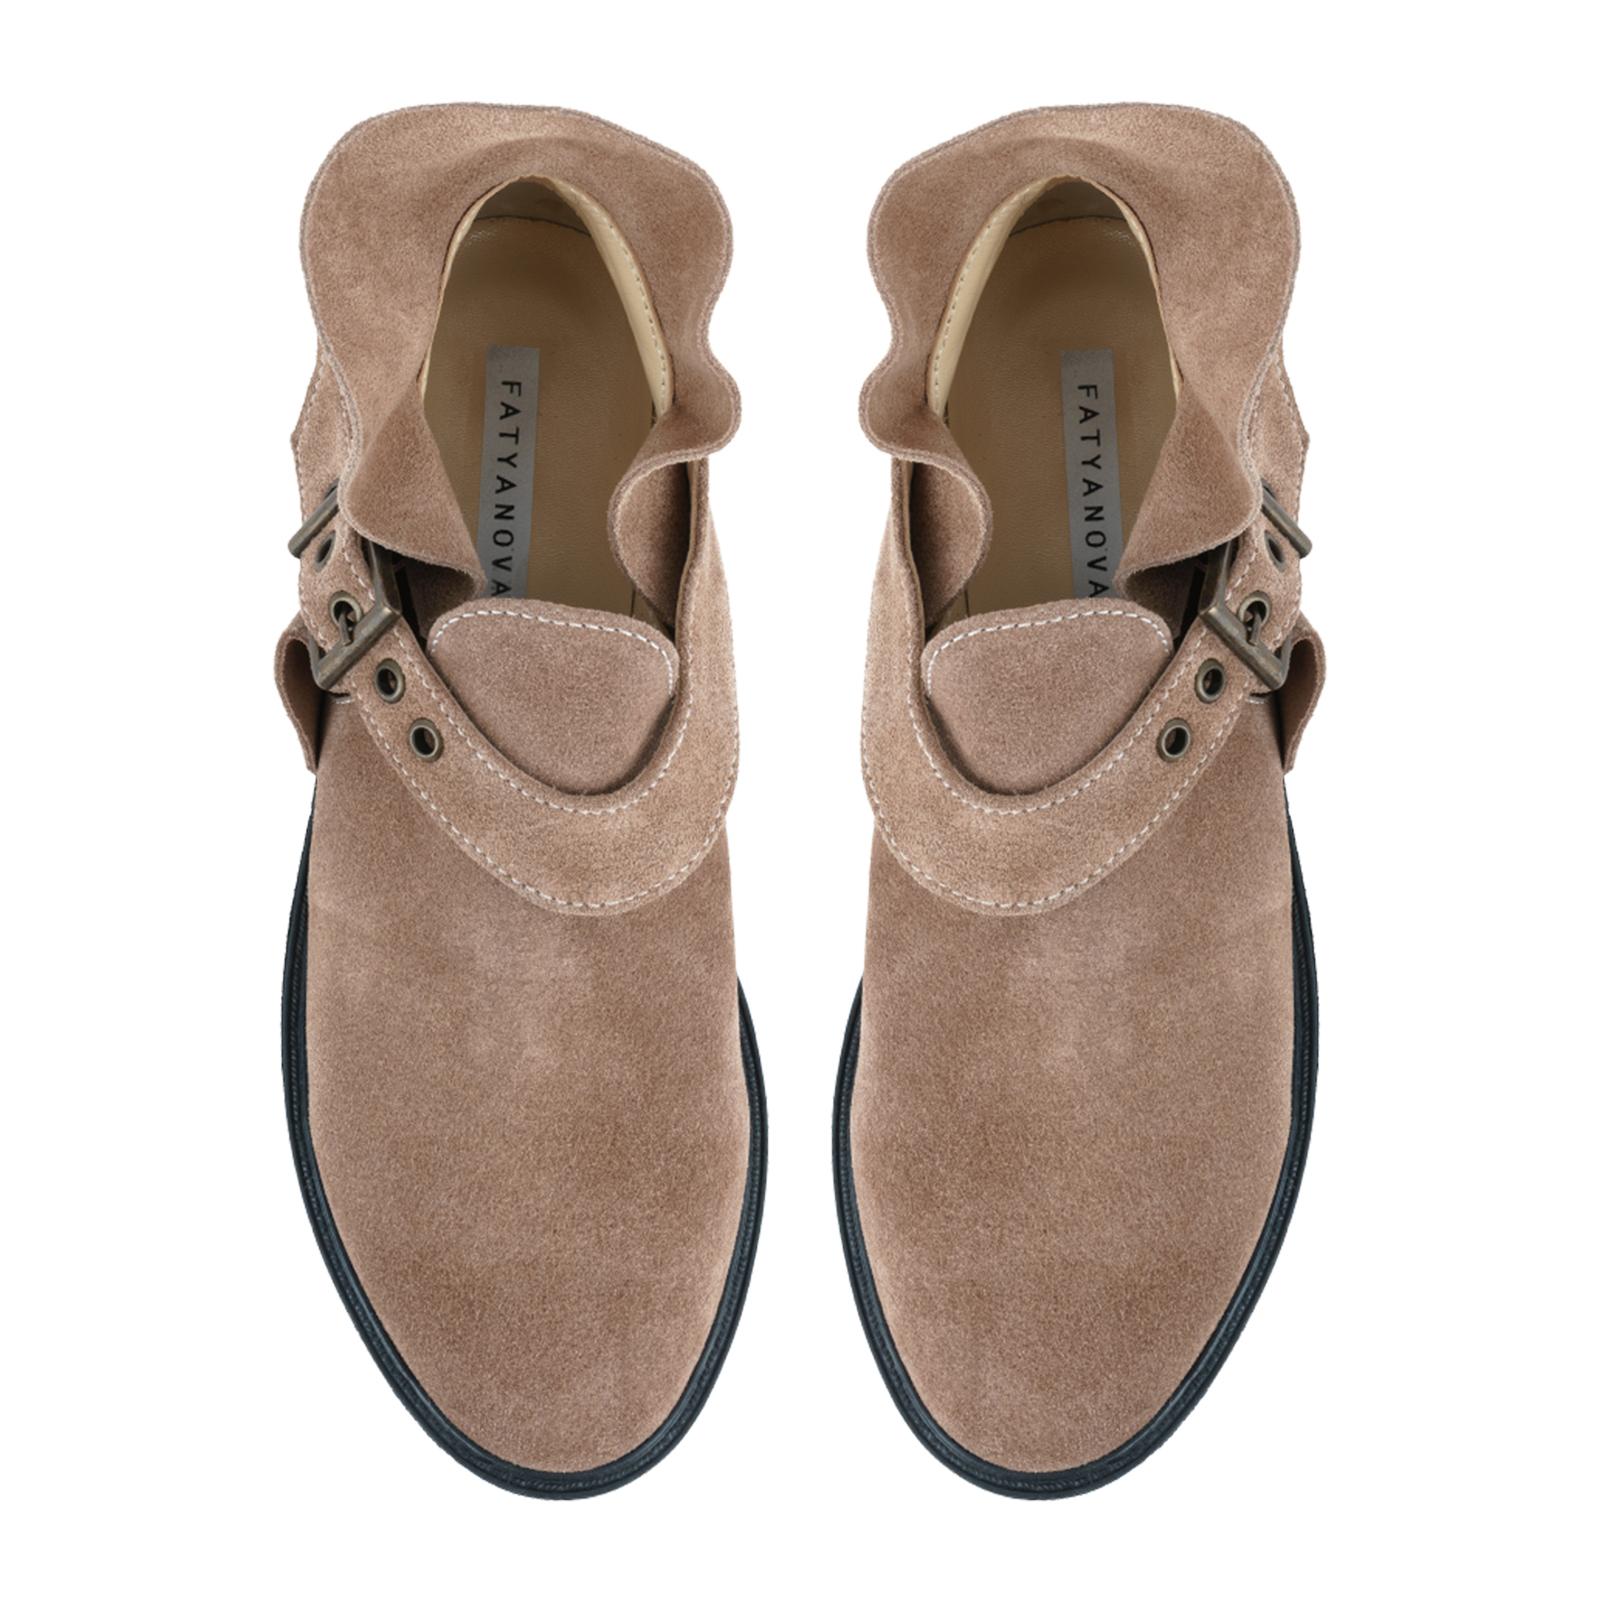 Полуботинки женские Ботинки Мерлин замша цвета капучино 100050 обувь бренда, 2017